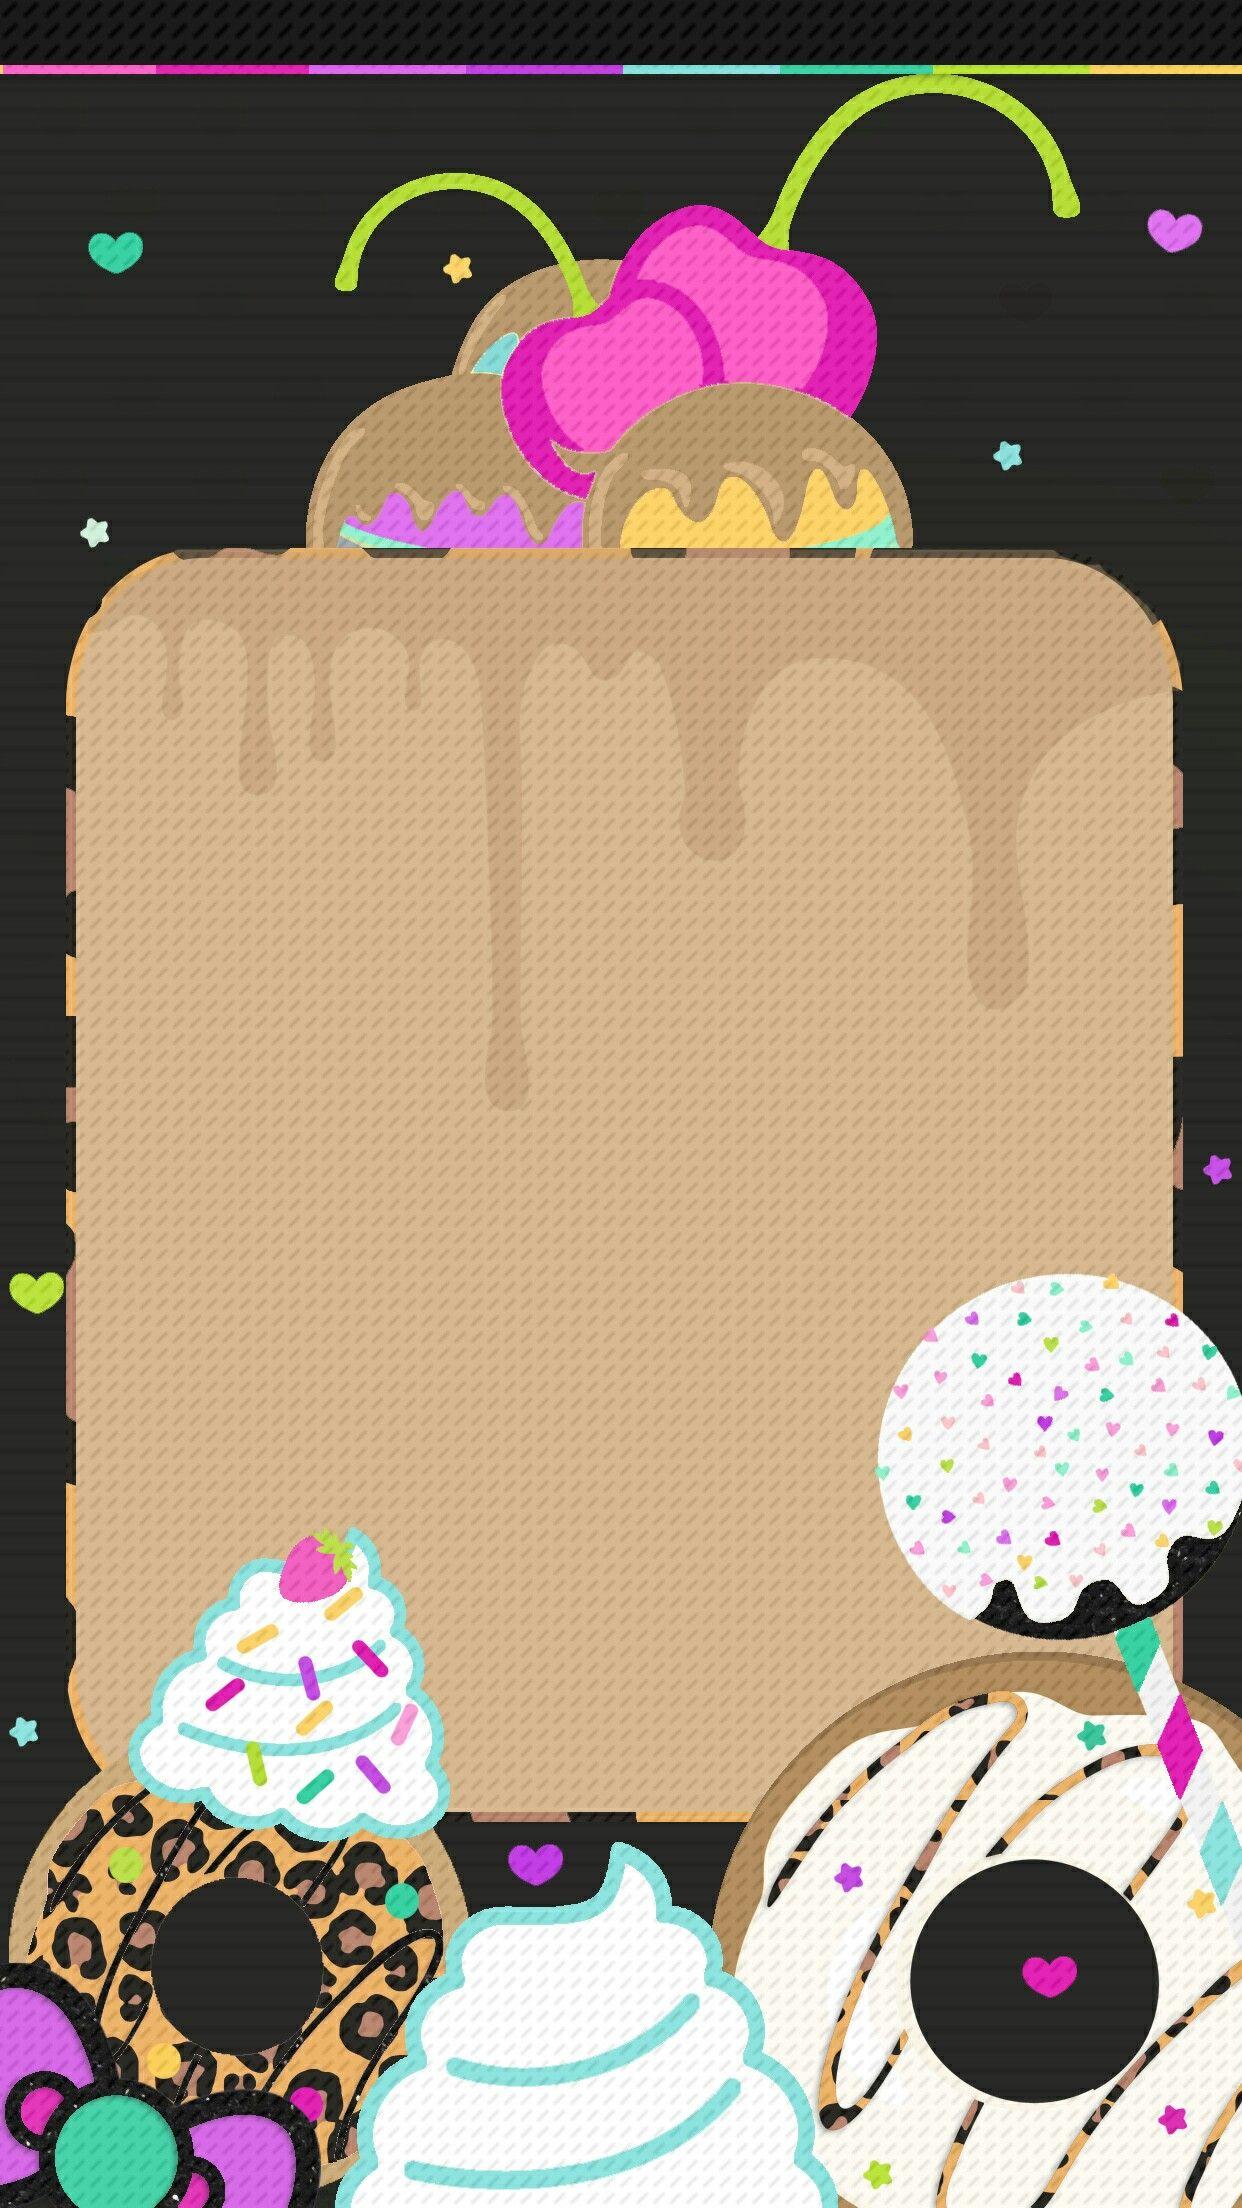 Amazing Wallpaper Hello Kitty Smartphone - 7dbd8d7cf13ed6cd376a73a5377318a7  HD_96792.jpg